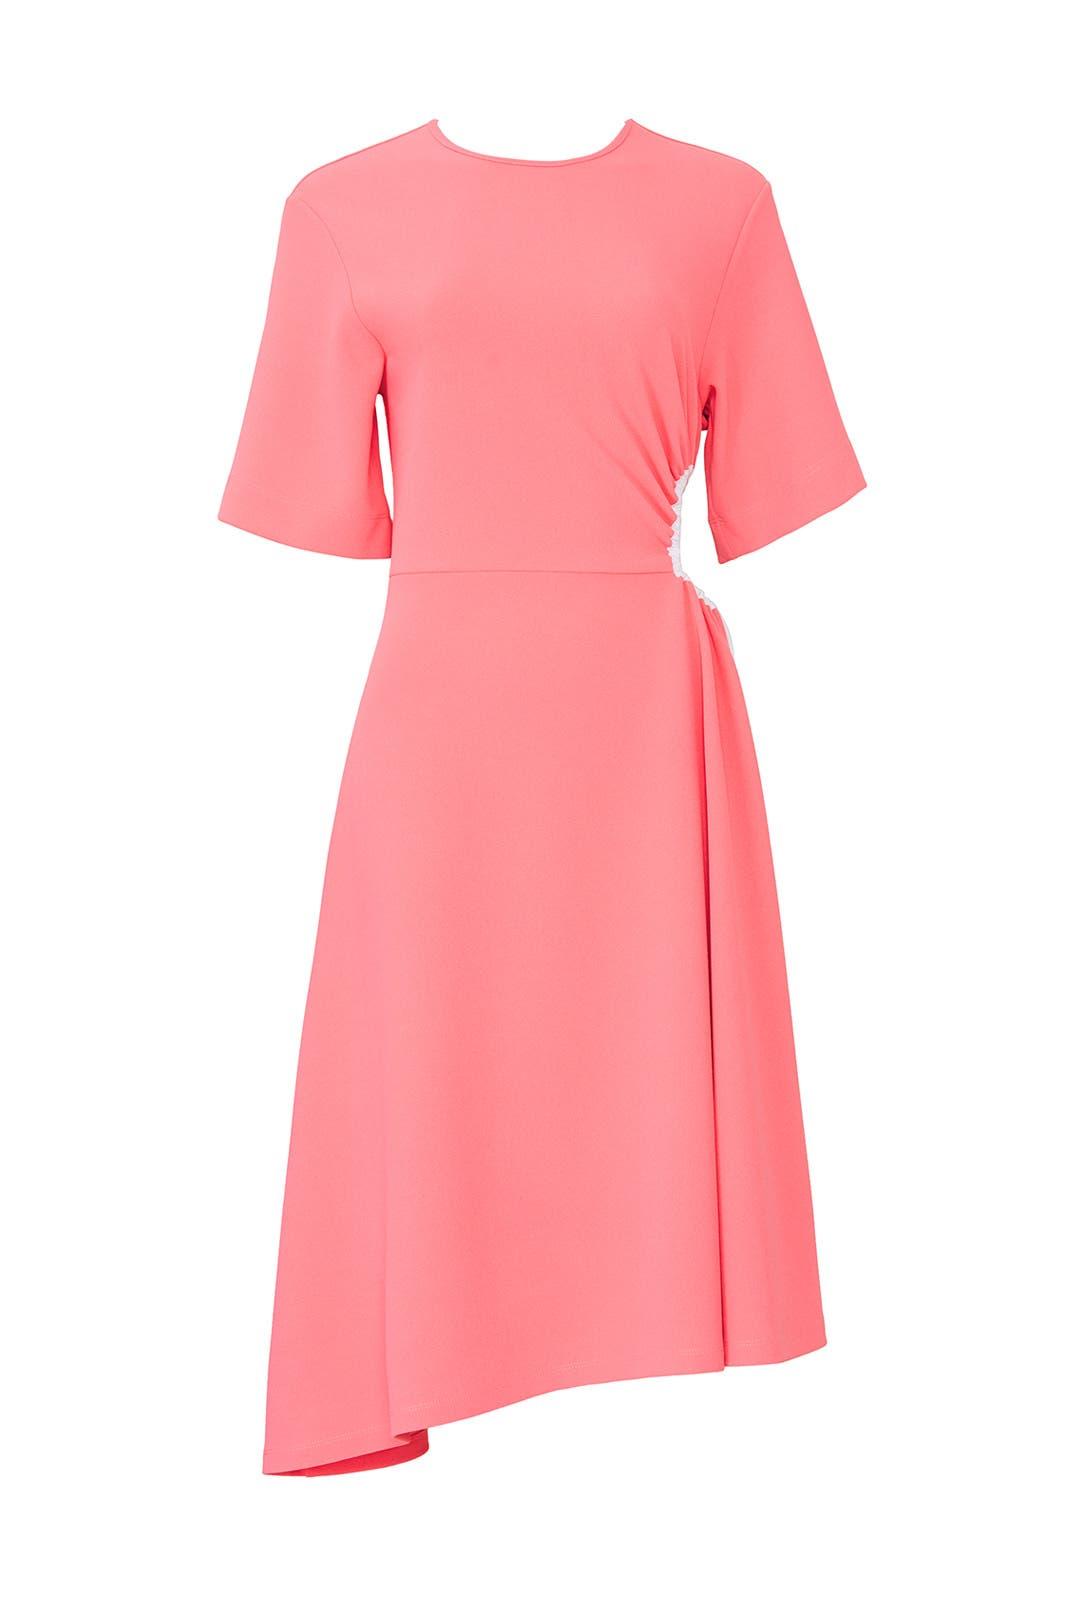 b1a9bbd78c See by Chloe Cut Out Midi Dress